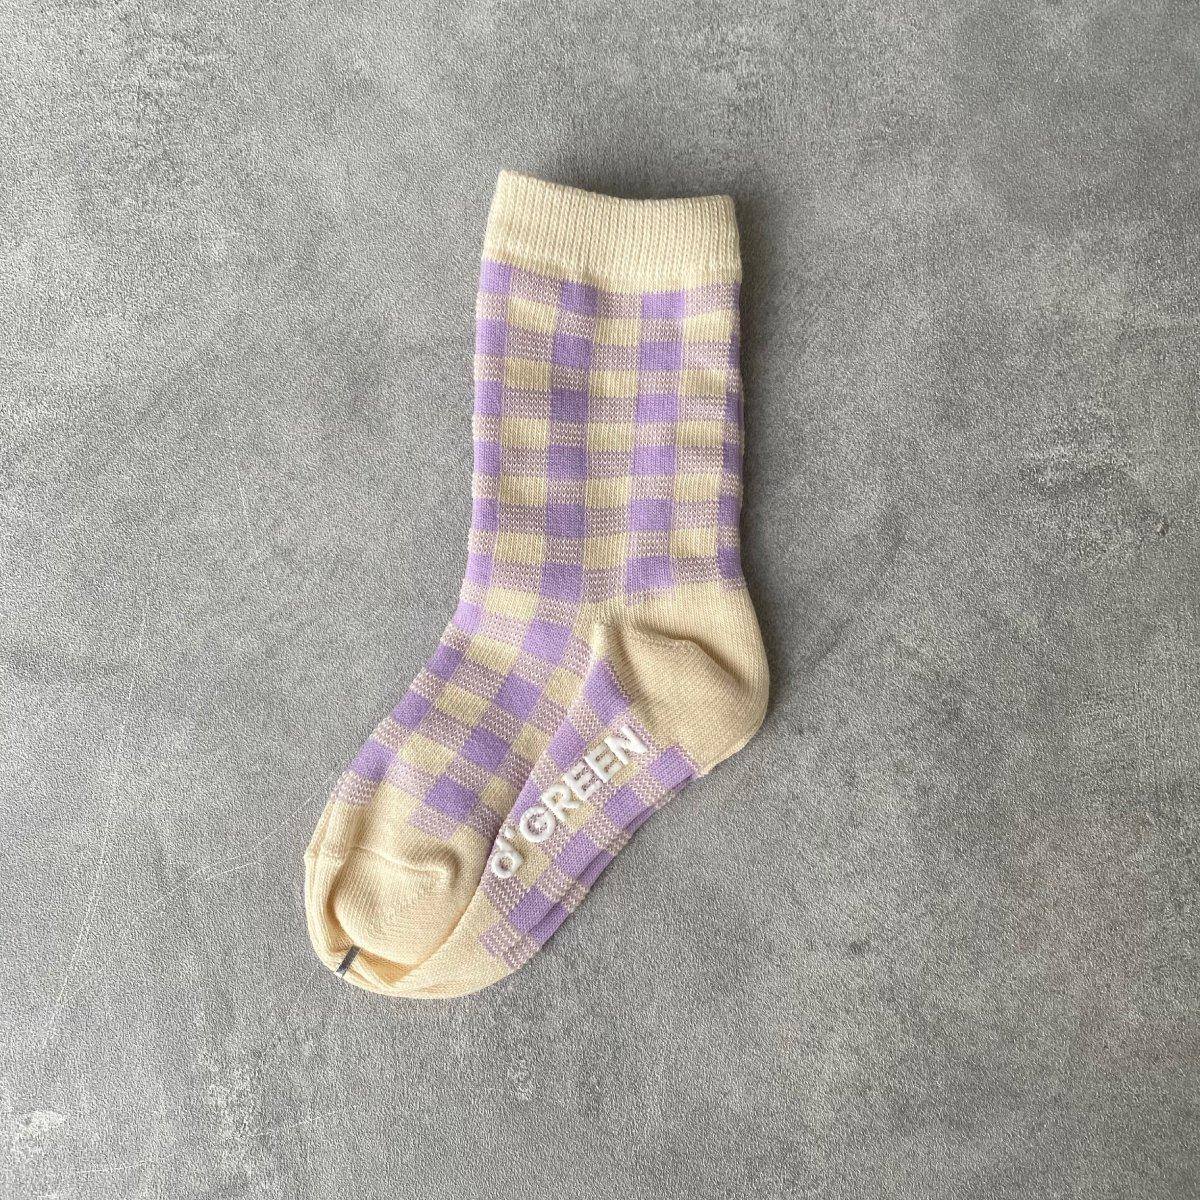 【BABY】Natural Check Socks 詳細画像1